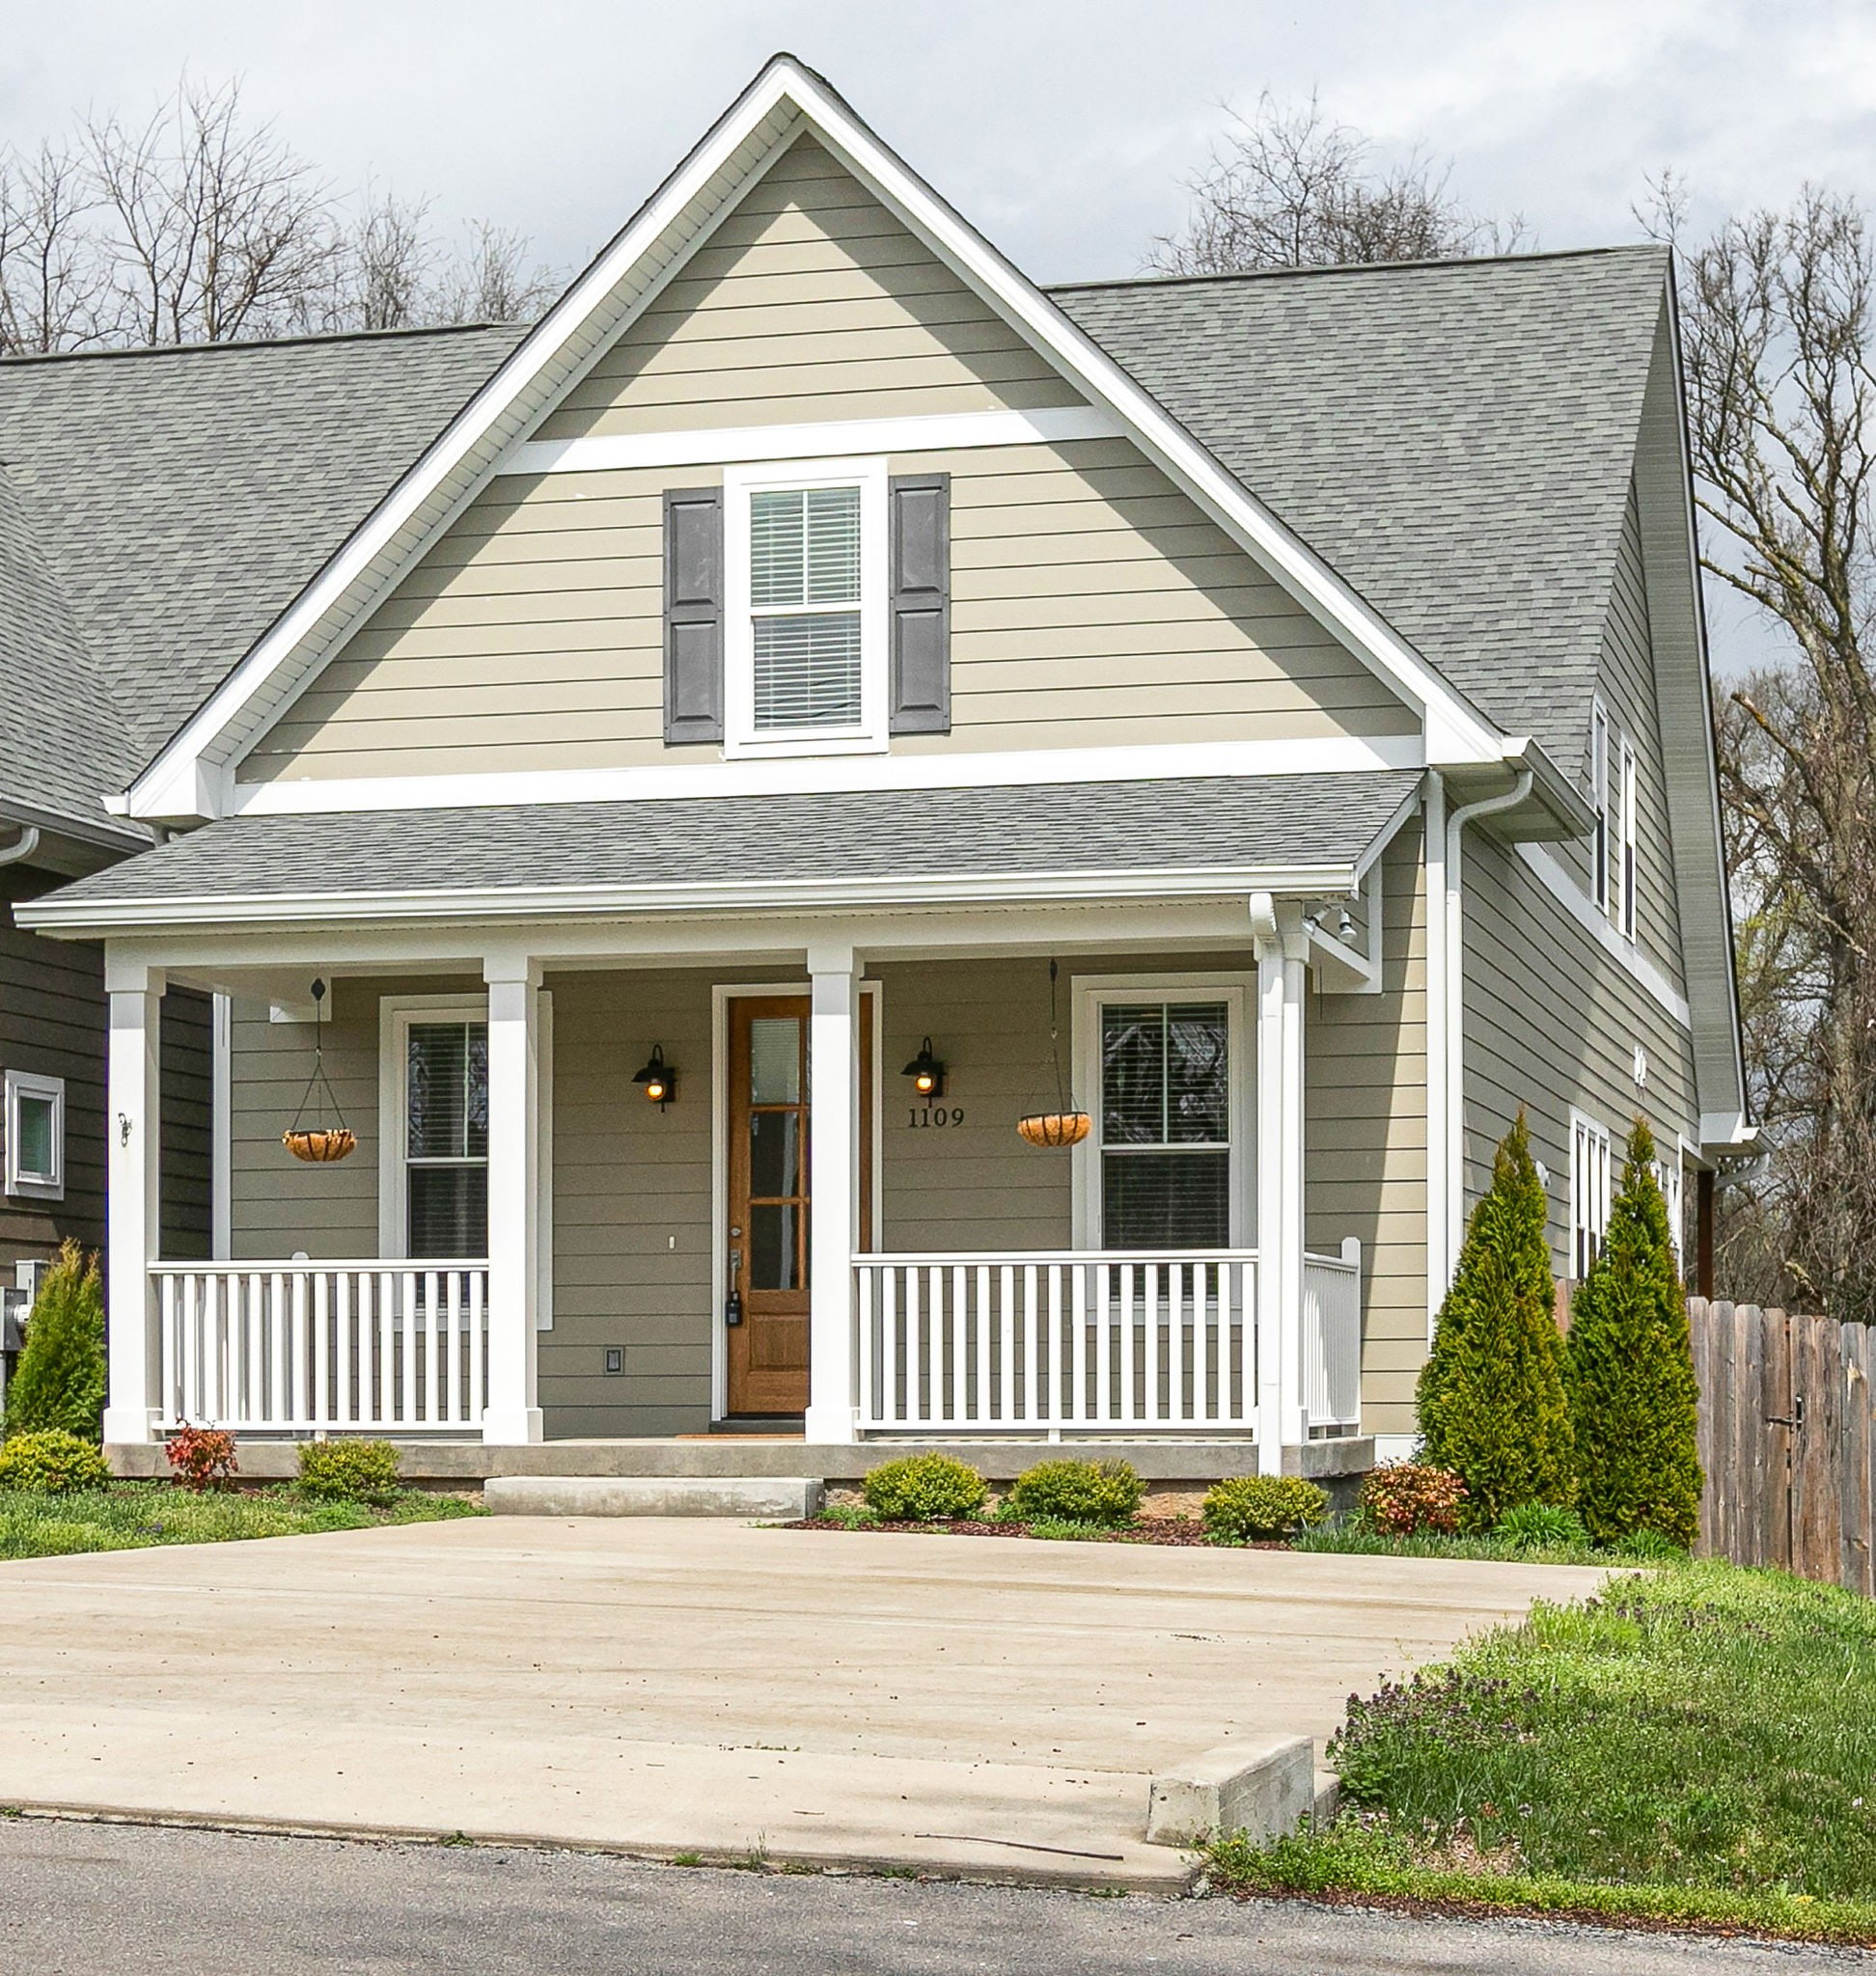 1109 McAlpine Ave, Nashville, TN 37216 - Nashville, TN real estate listing